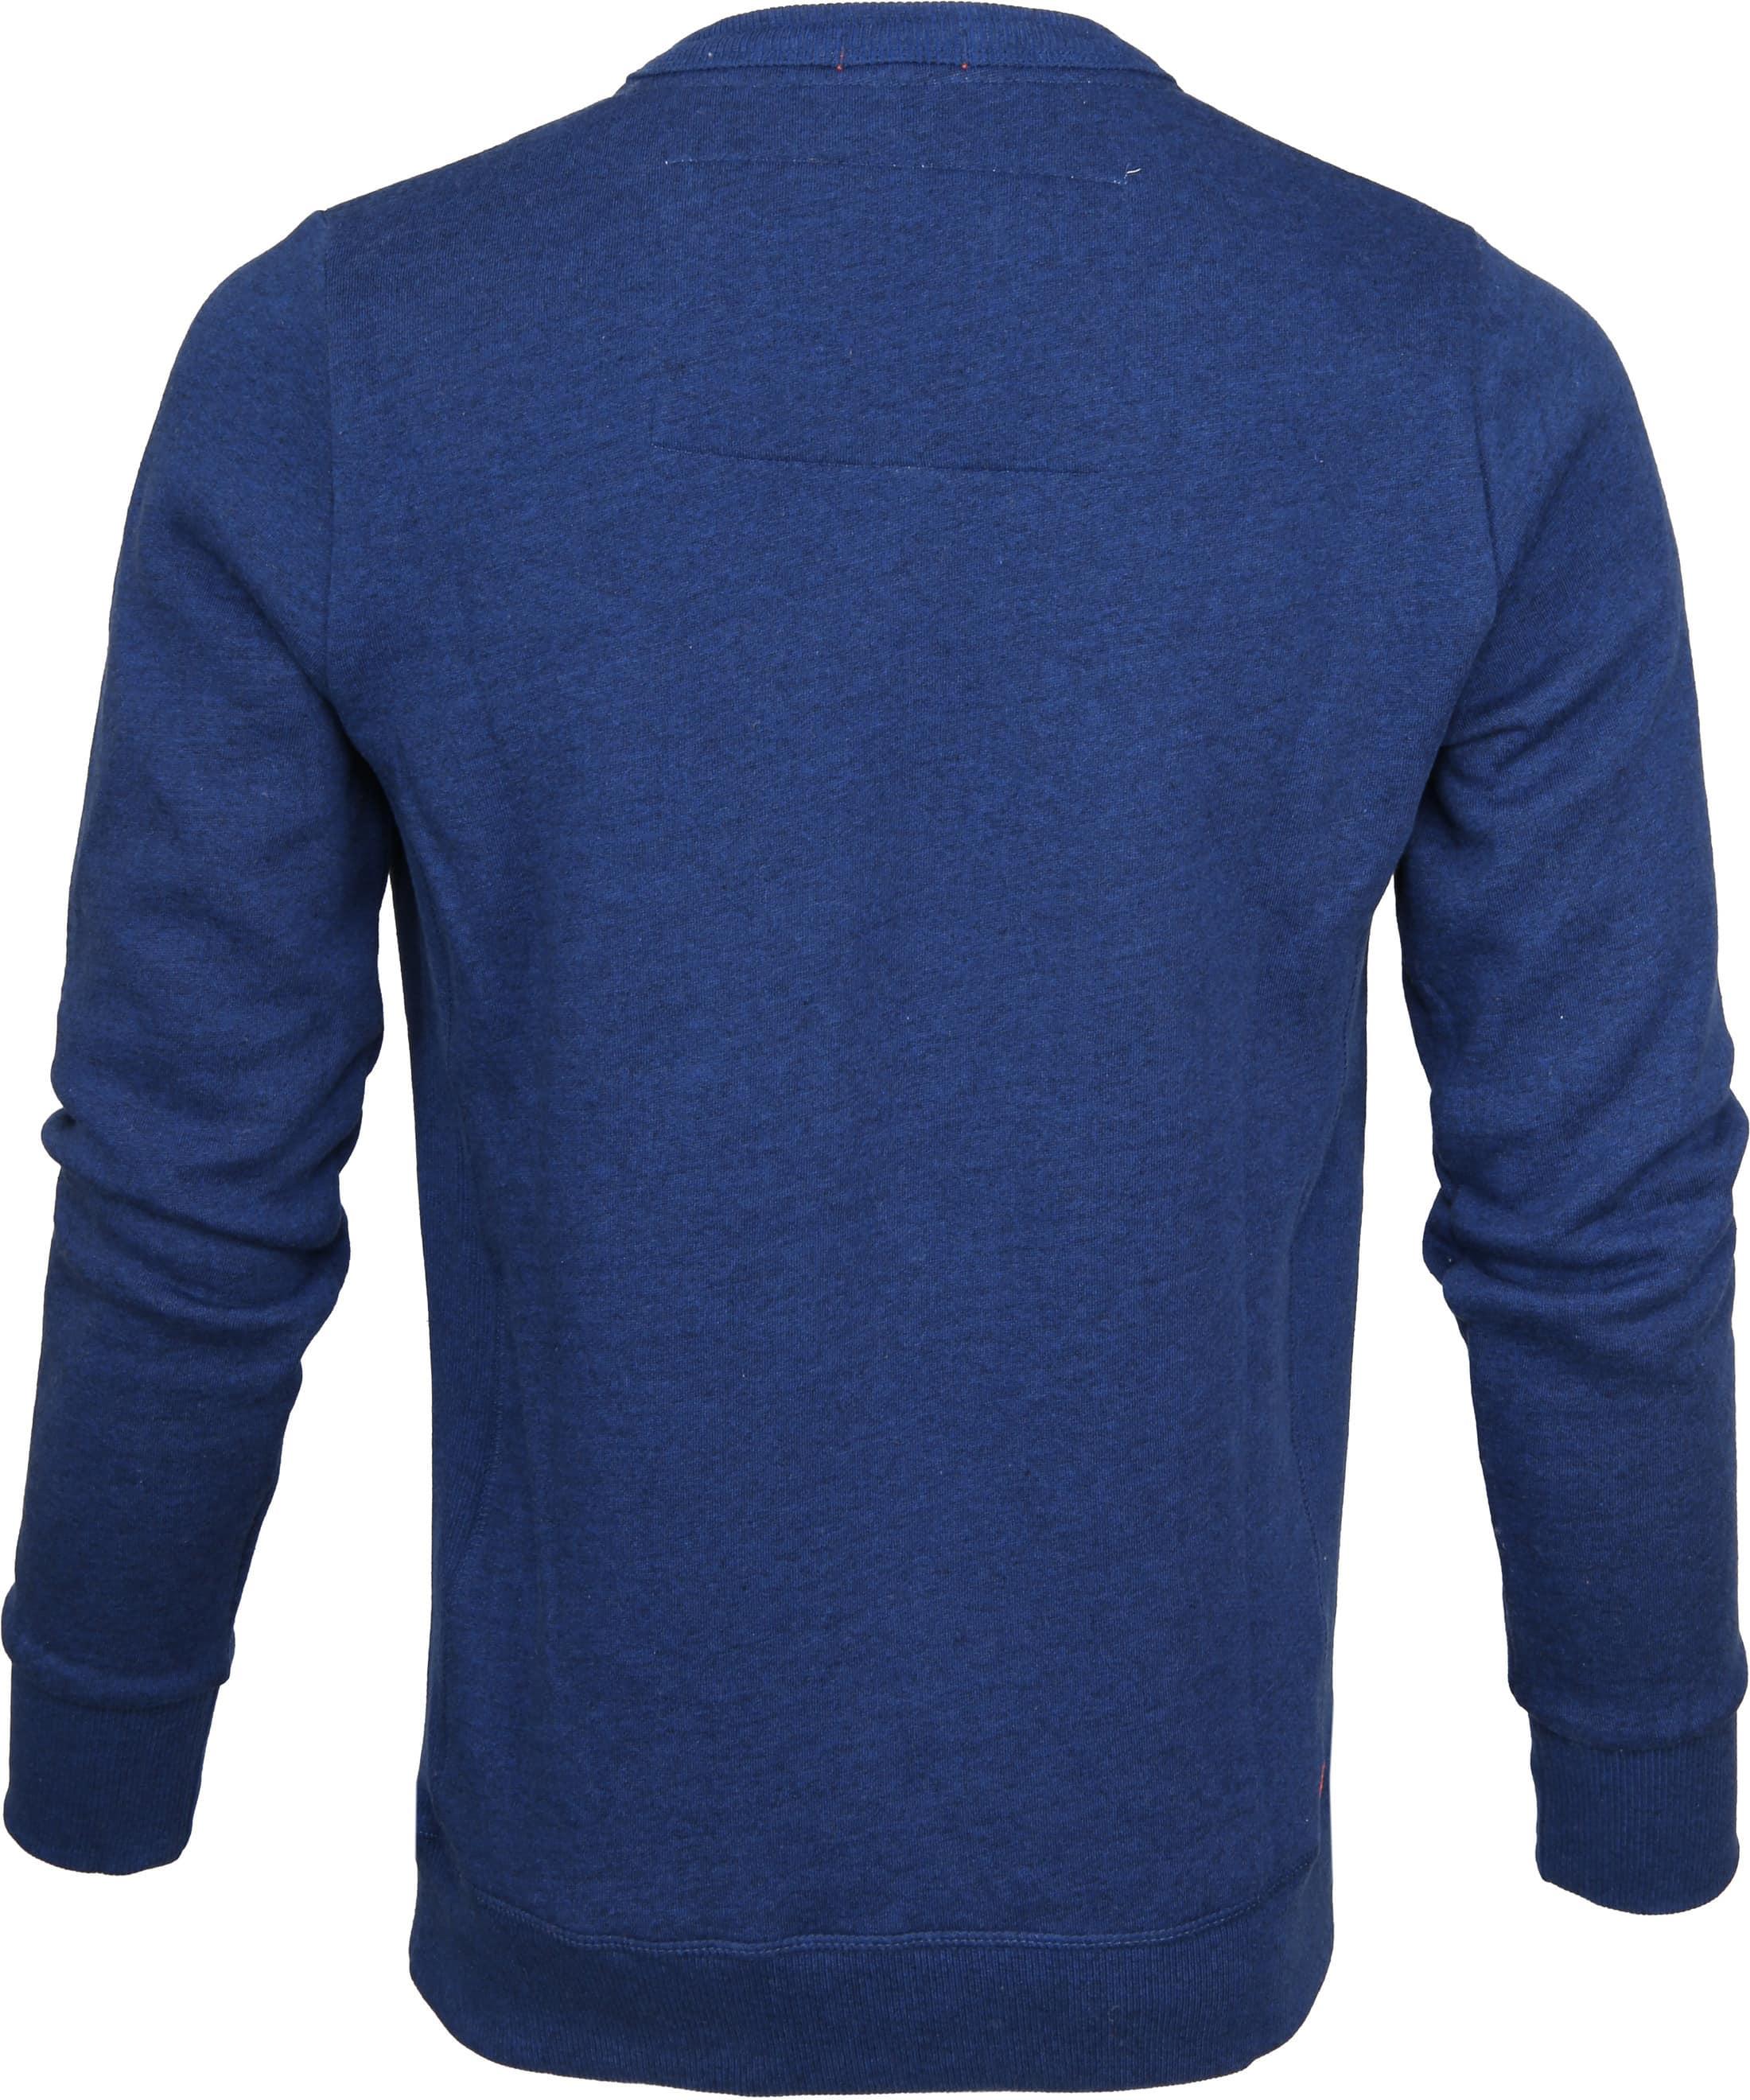 Superdry Sweater Melange Blauw foto 2